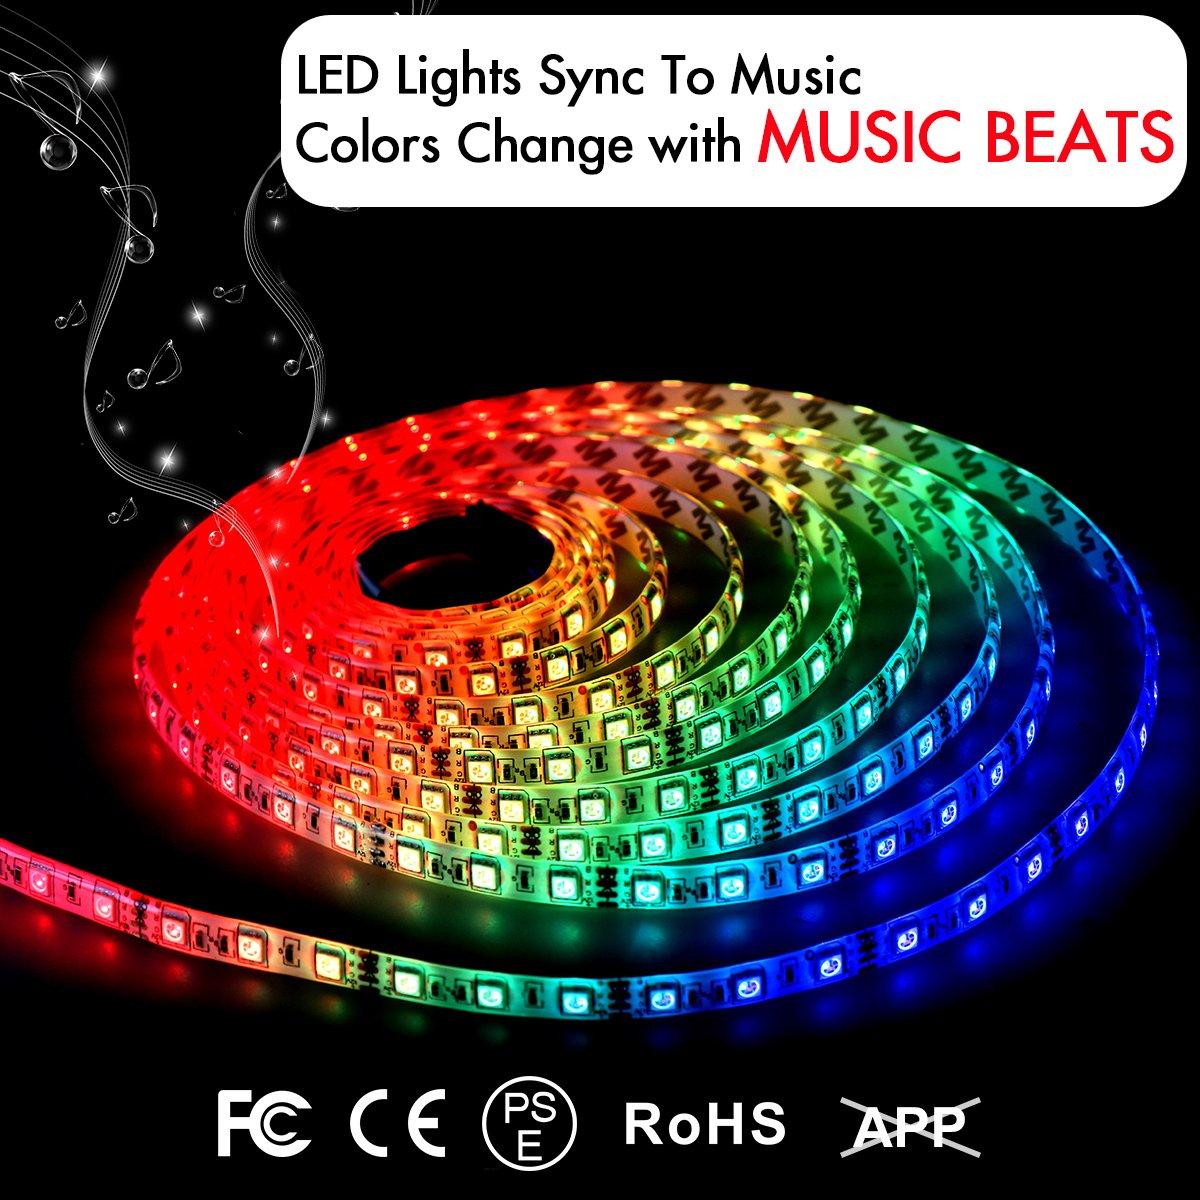 LED Strip Lights LED Lights Sync To Music 16.4Ft/5M LED Light Strip 300 LED Lights SMD 5050 Waterproof Flexible RGB Strip Lights IR Controller+12V 3A Power By DotStone